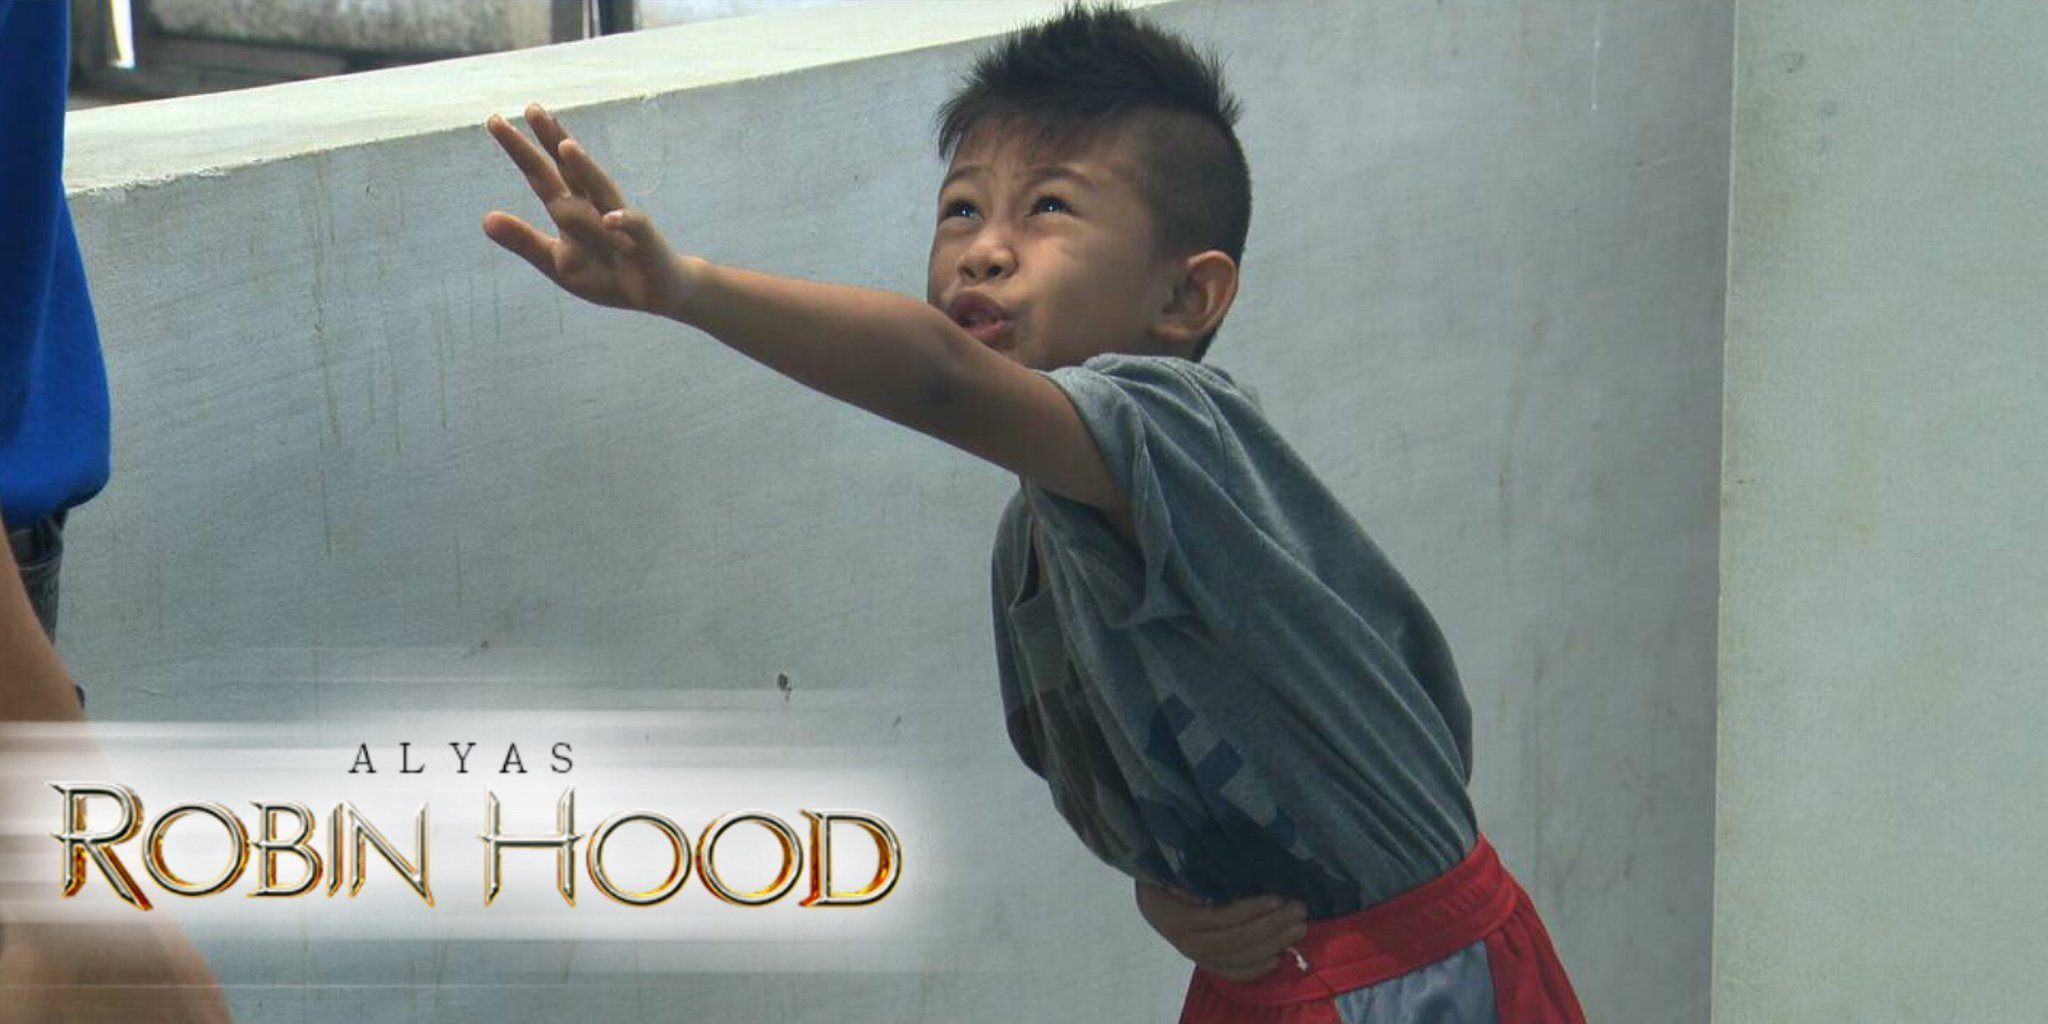 Kenken Nuyad in Alyas Robin Hood (2016)